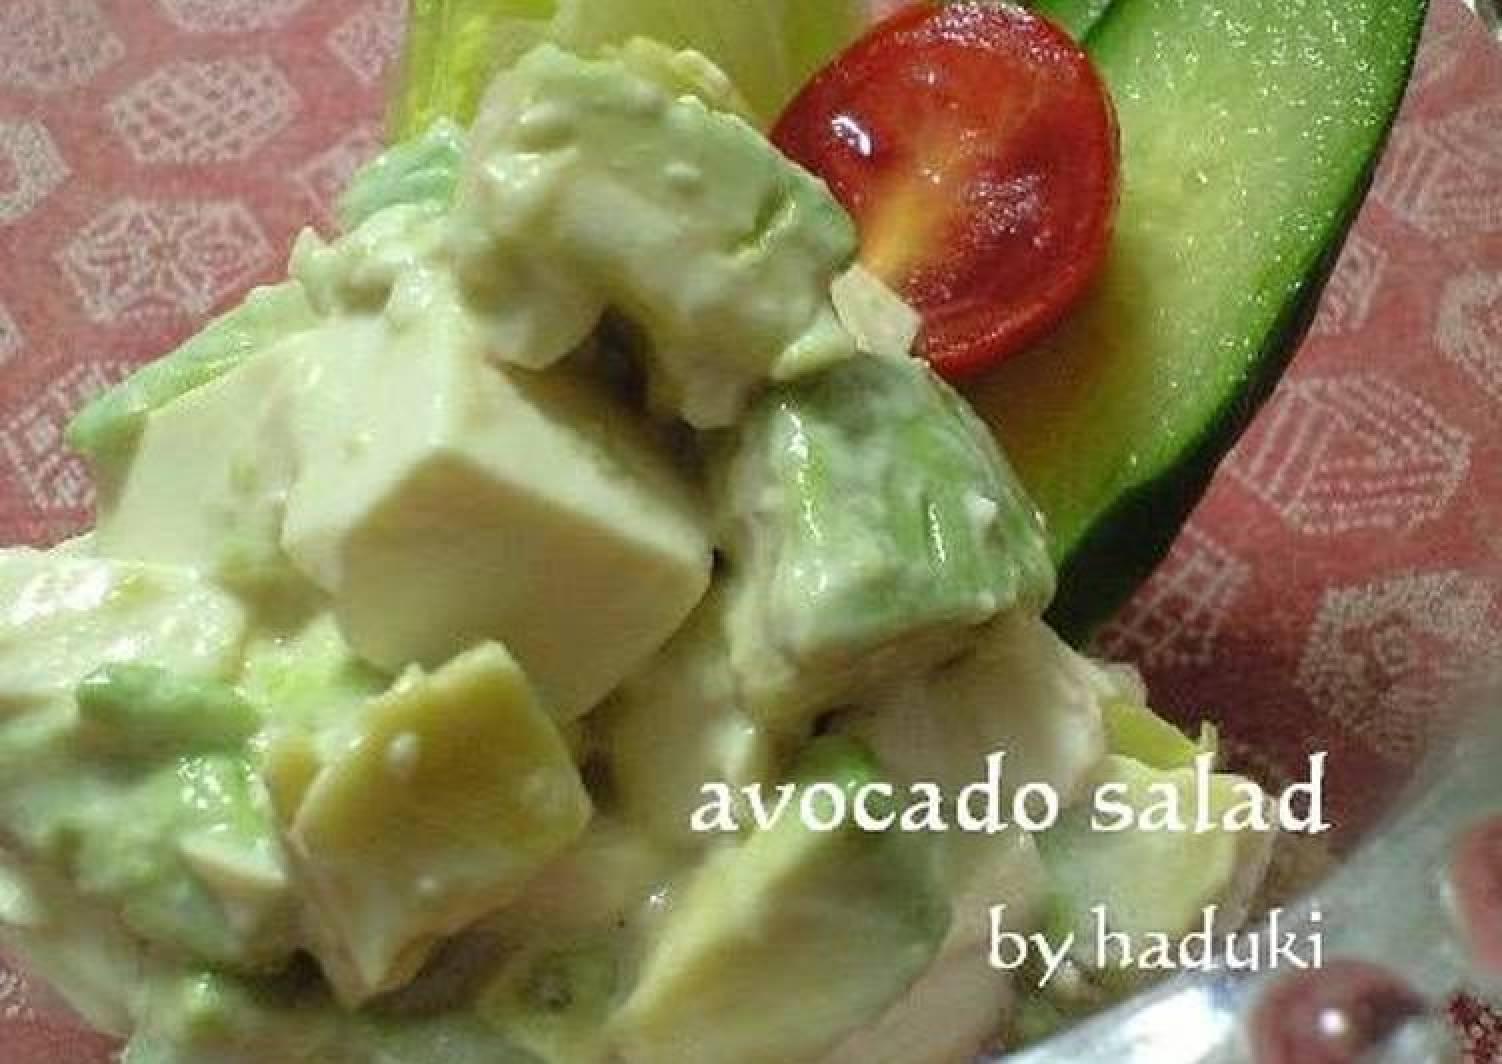 Avocado and Silken Tofu Salad